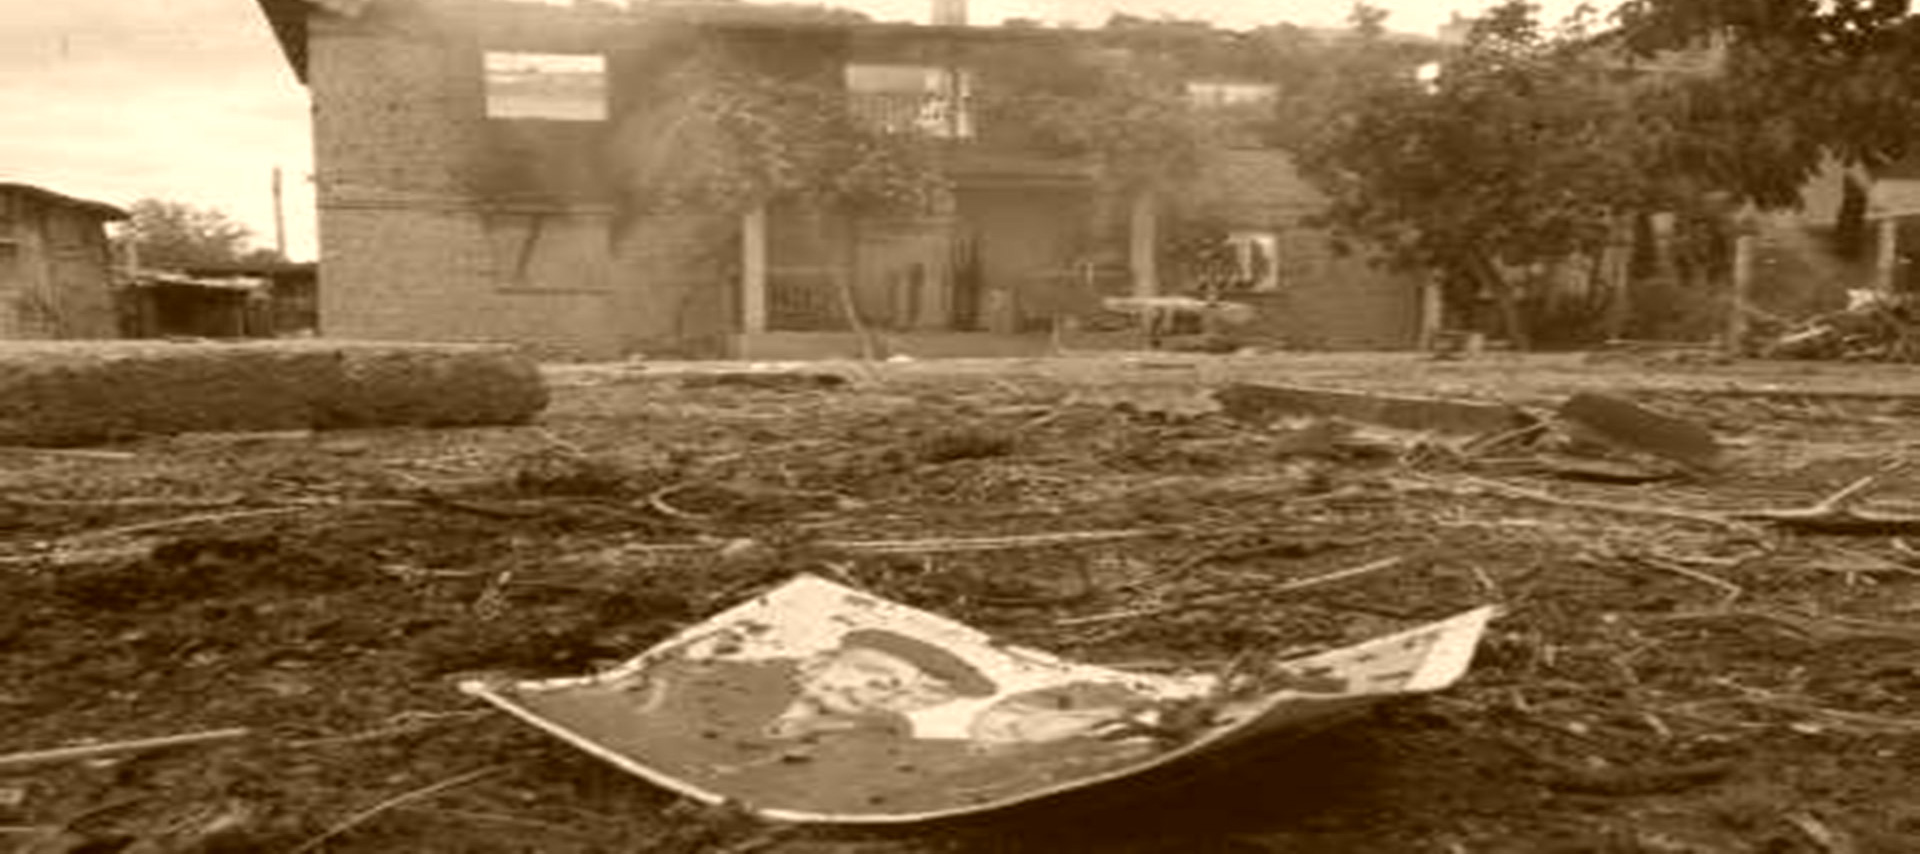 obilic-2004-bilo-gde-1991-2004